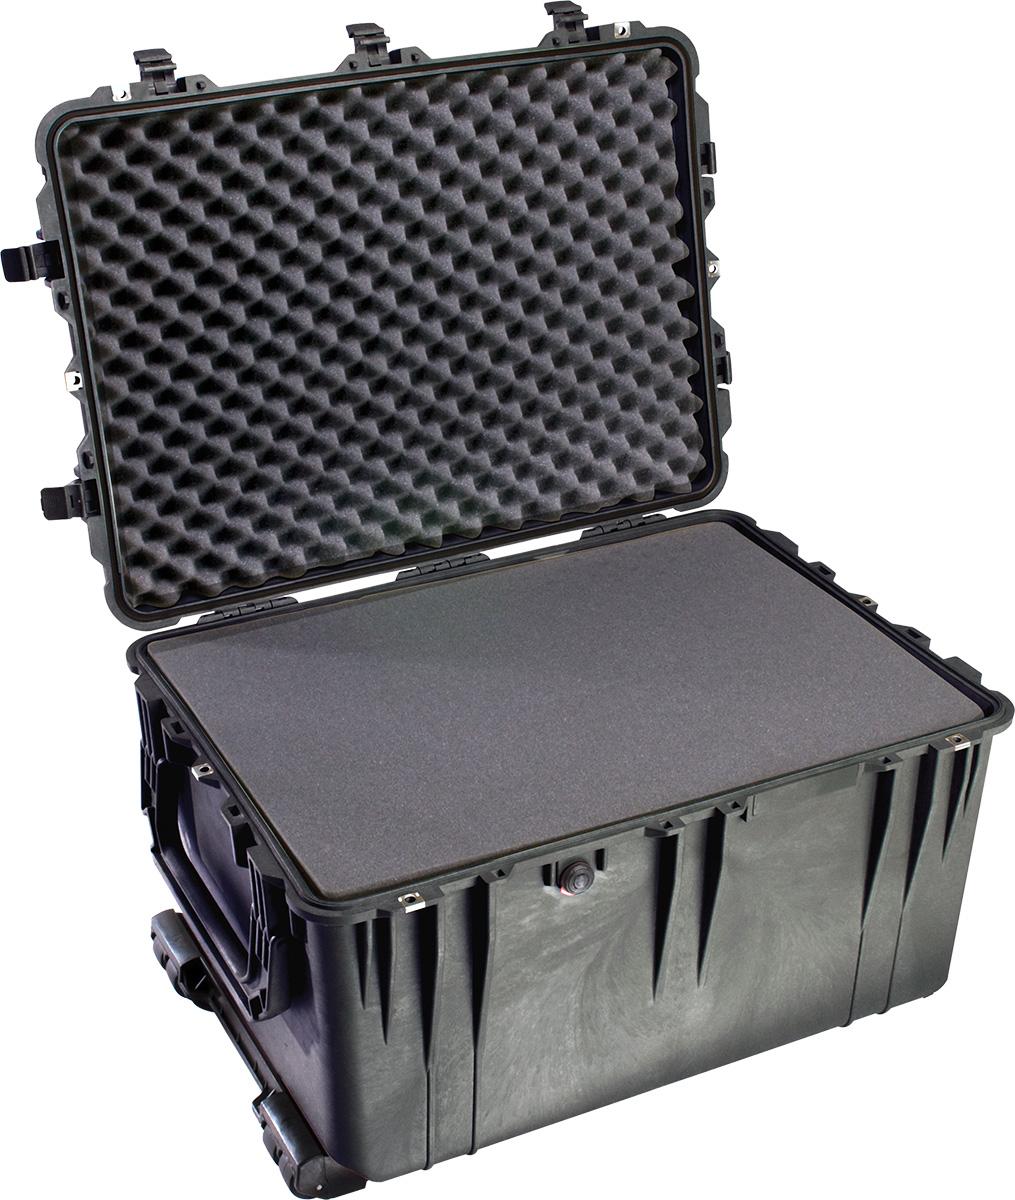 pelican 1660 large waterproof hard case